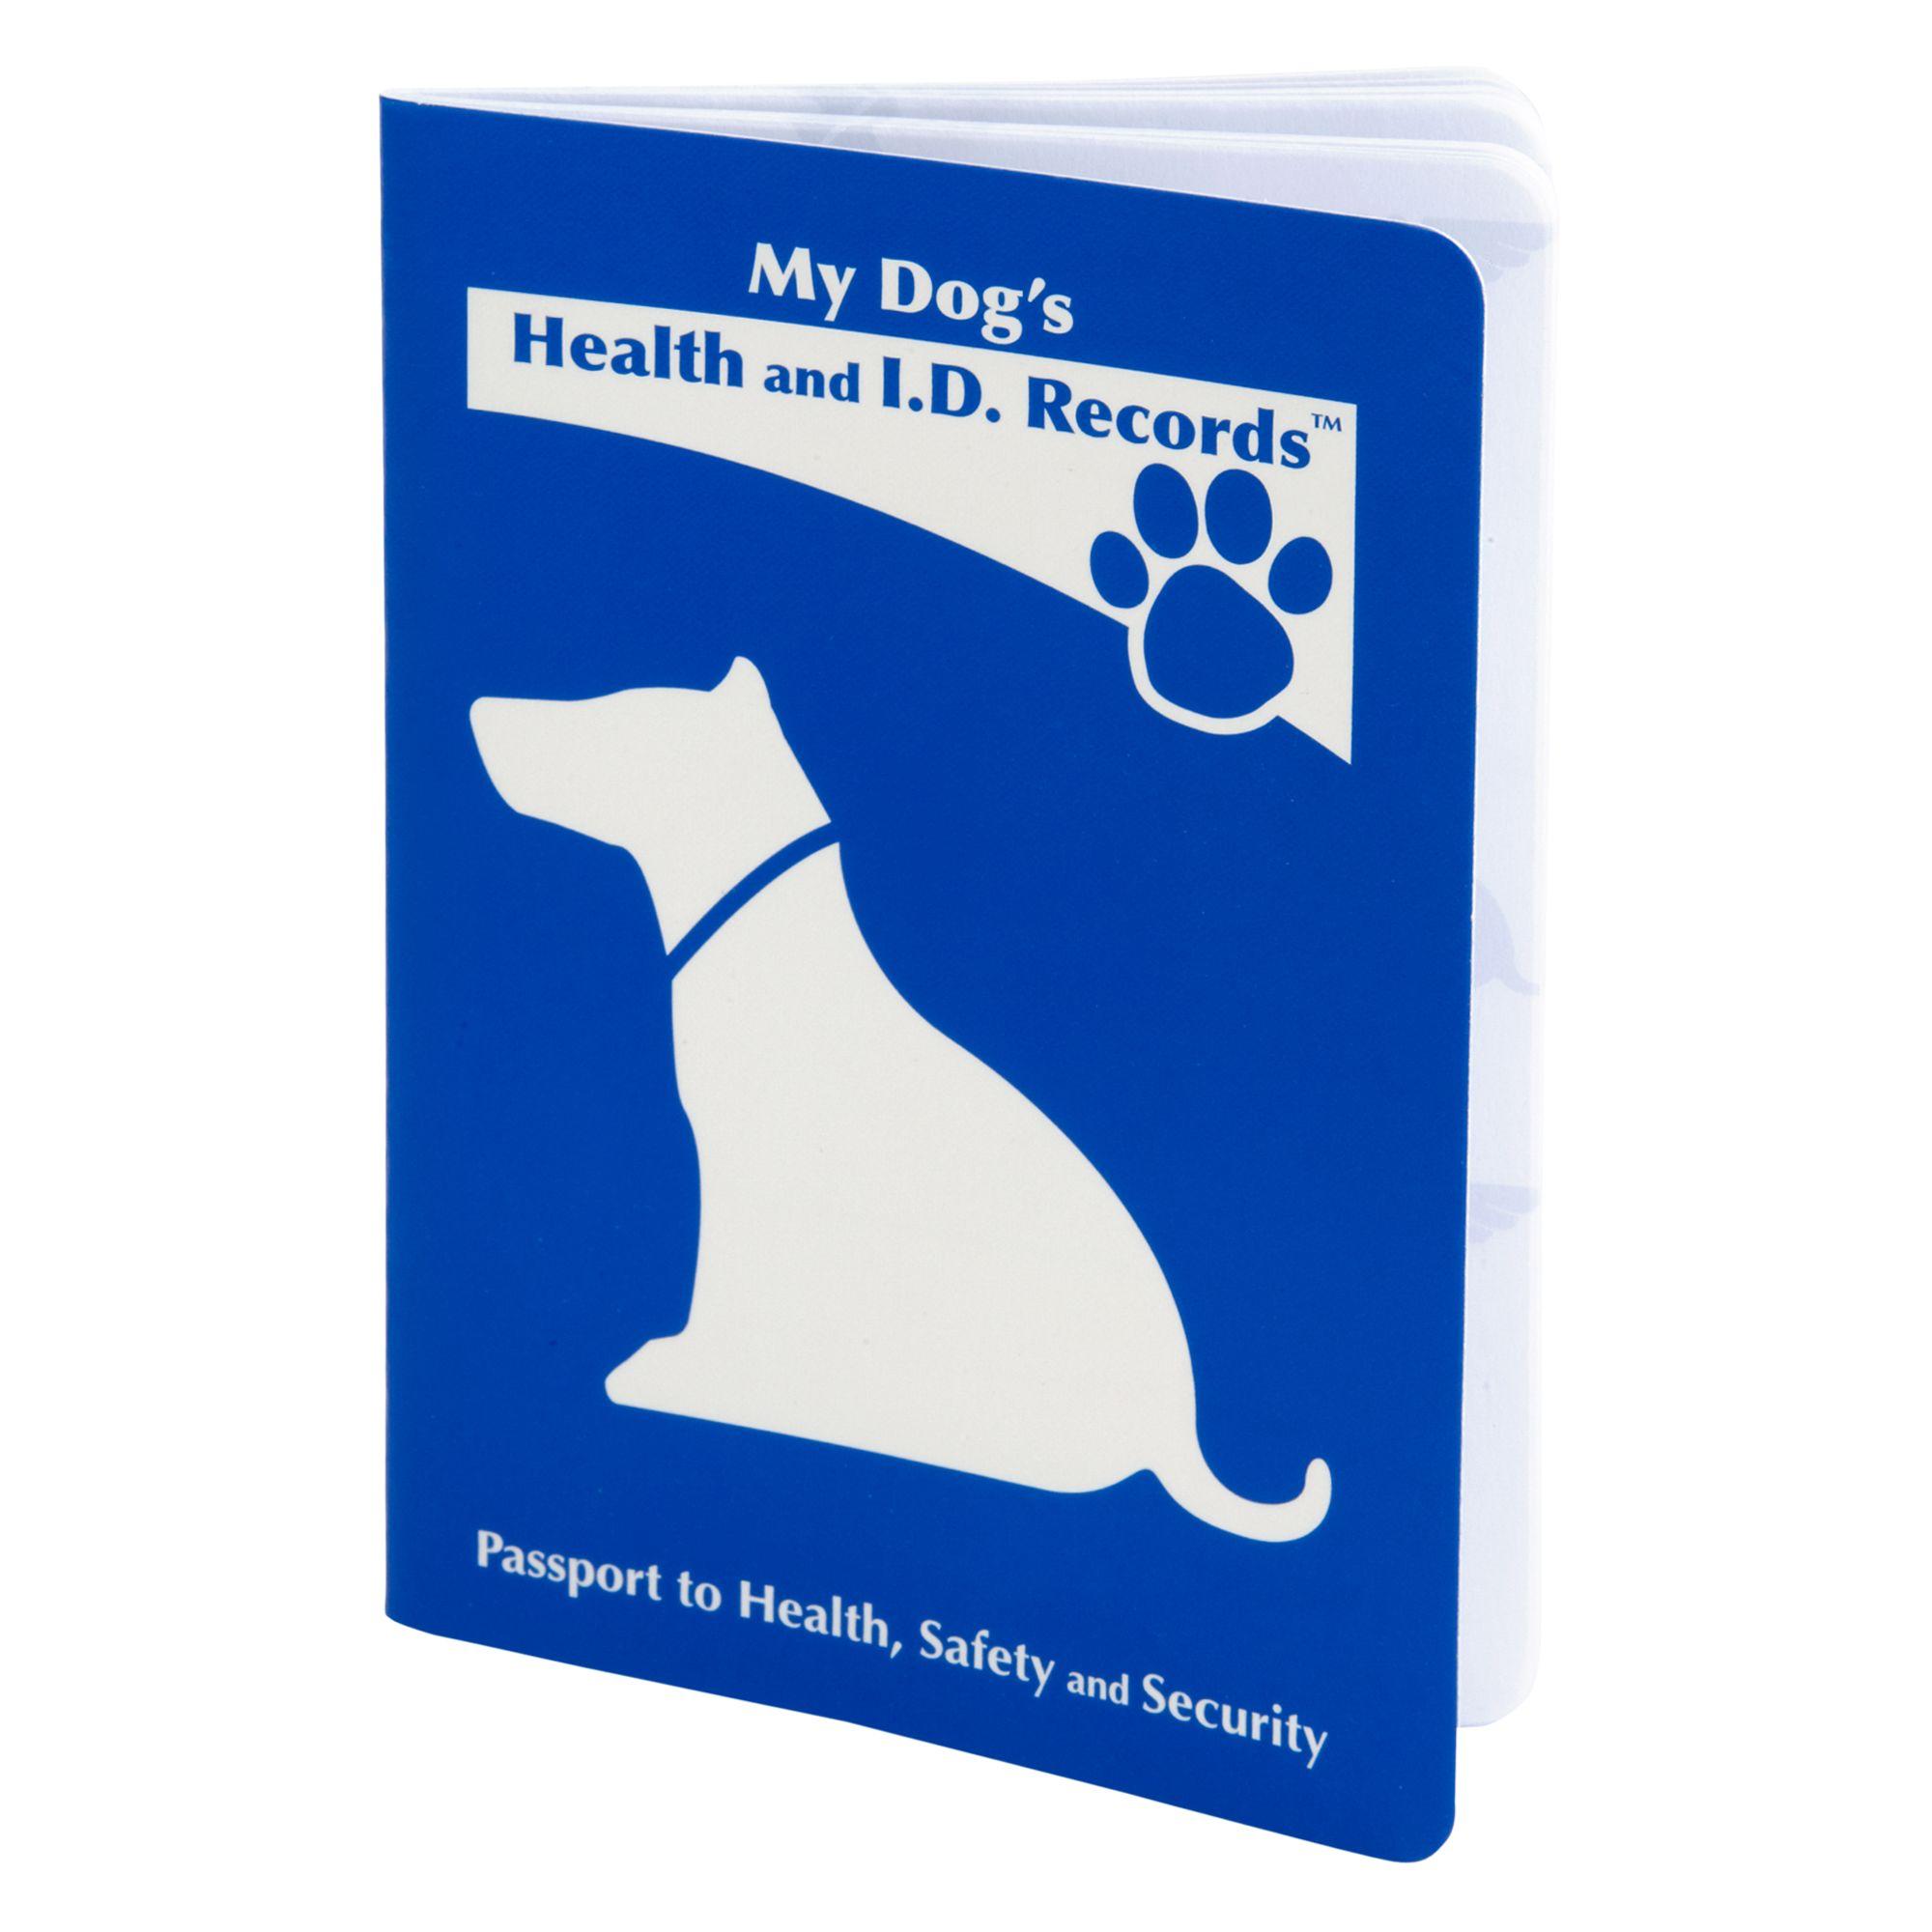 Mdi Health And I.d. Record Dog Passport Blue